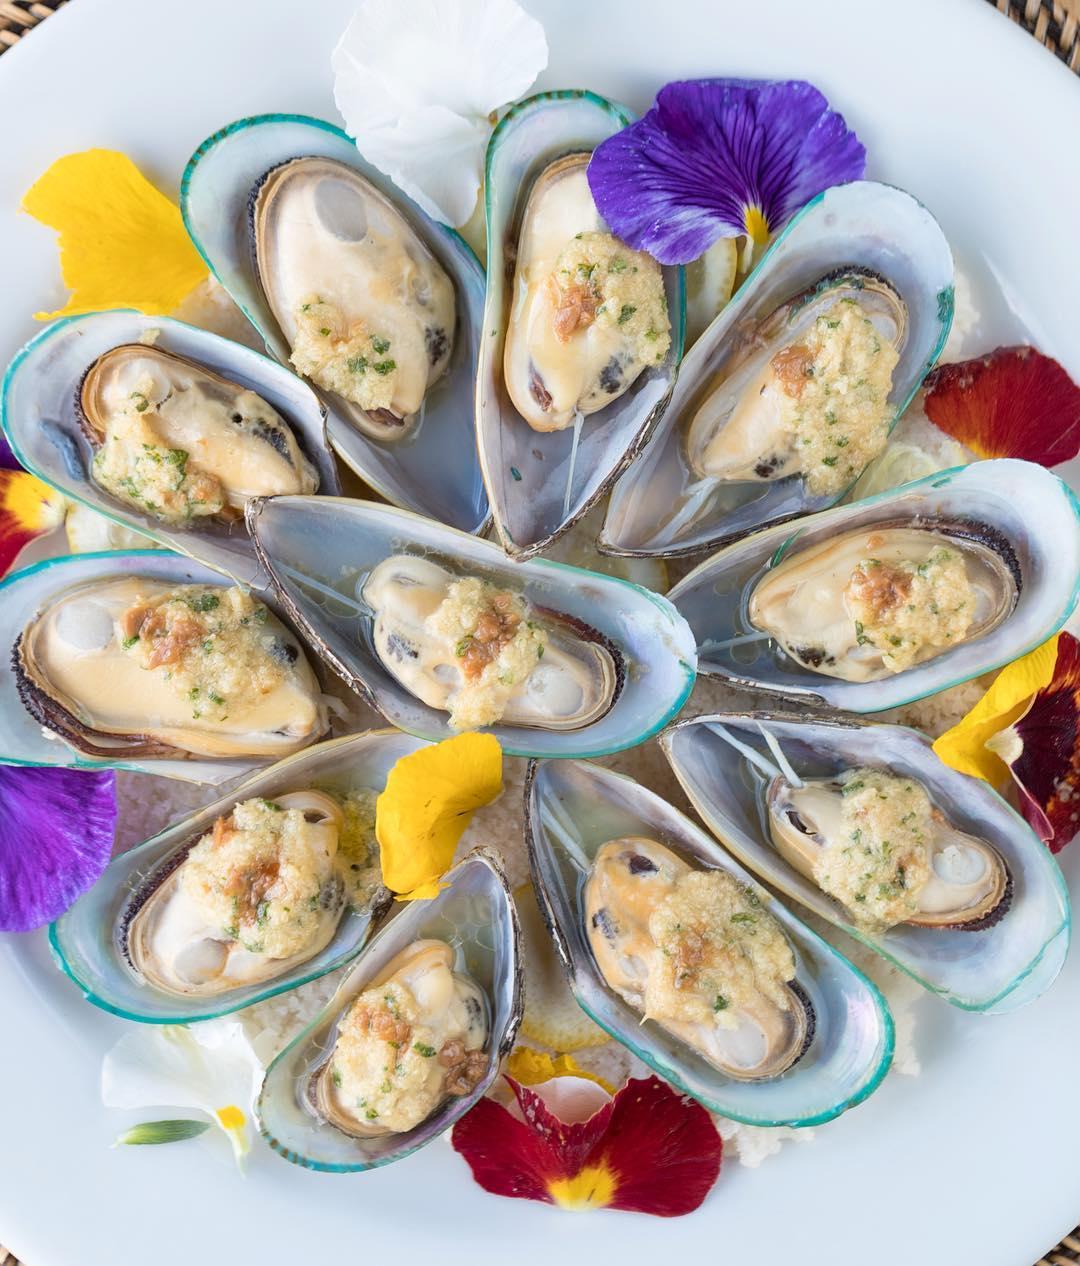 nolisoli fixture eats restaurants los angeles silver lake california filipino restaurant food maam sir